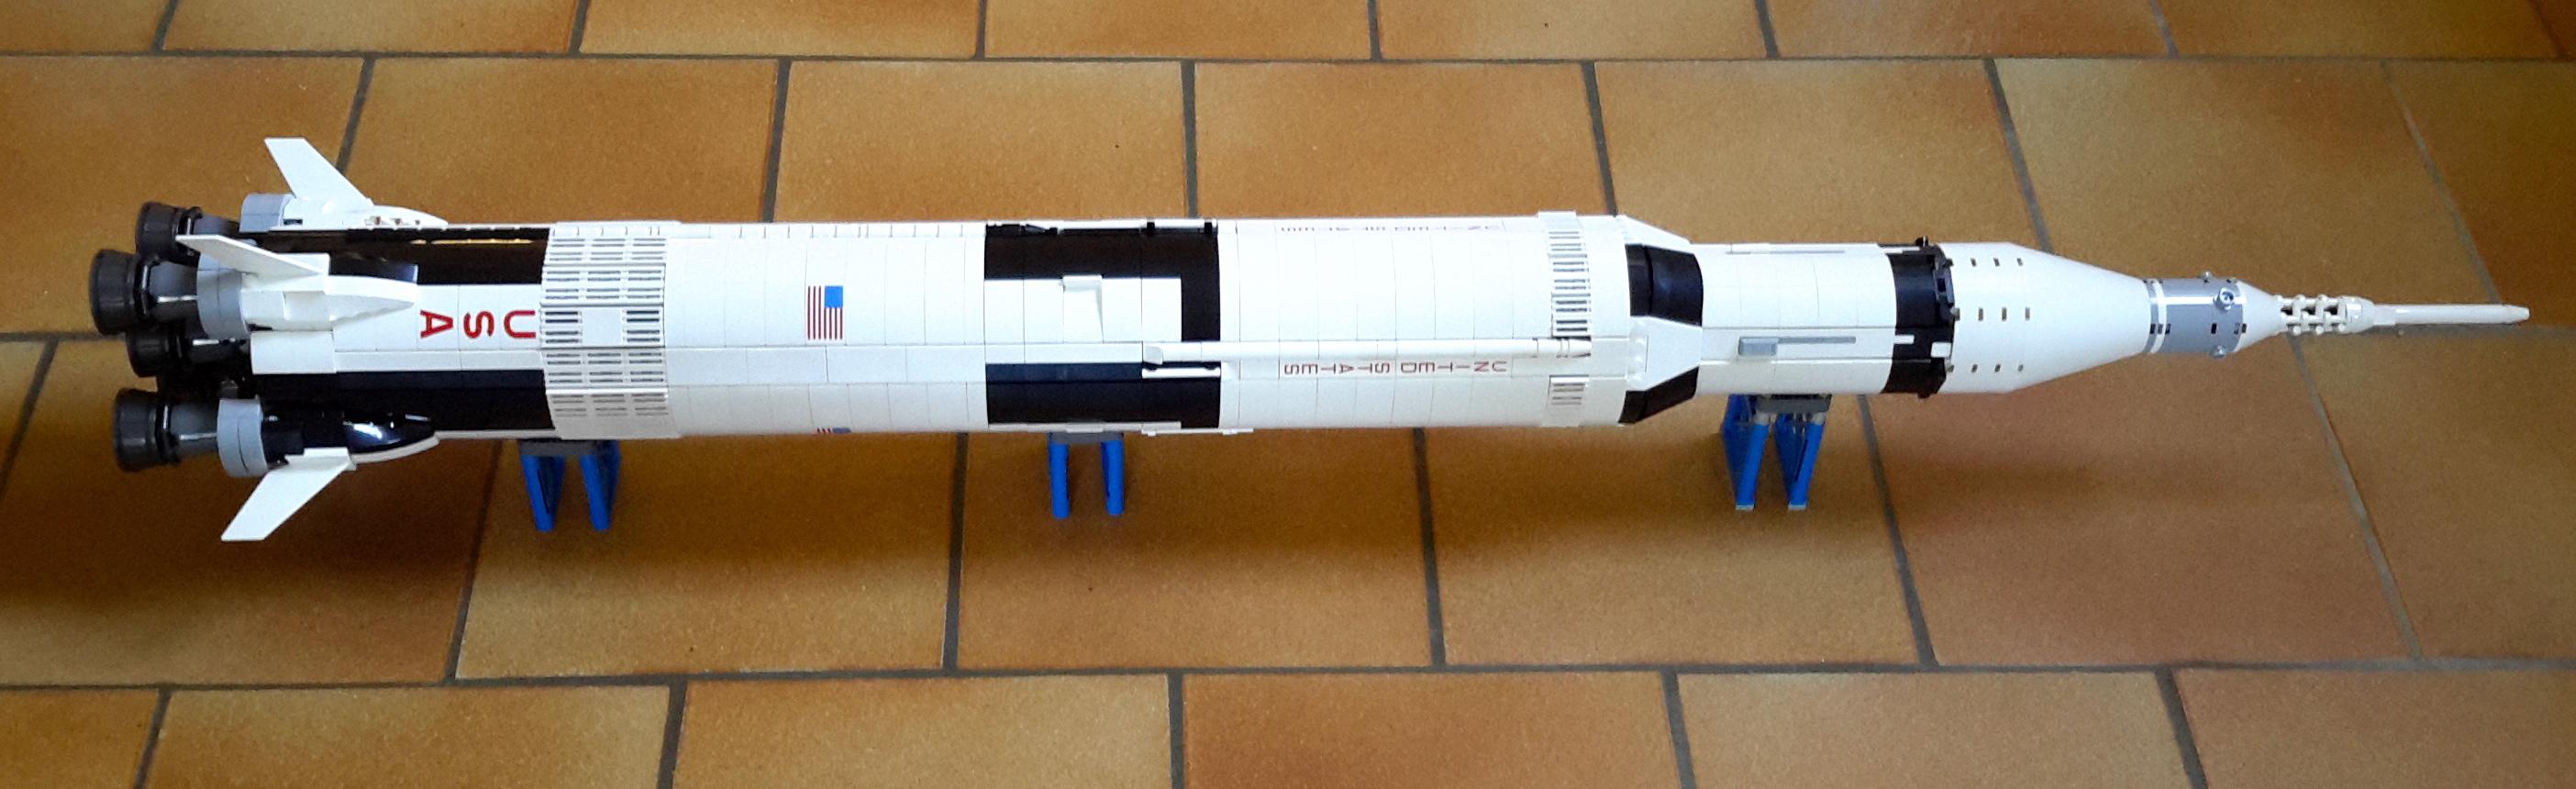 Review : LEGO Ideas 21309 Nasa Apollo Saturn V0611_085215